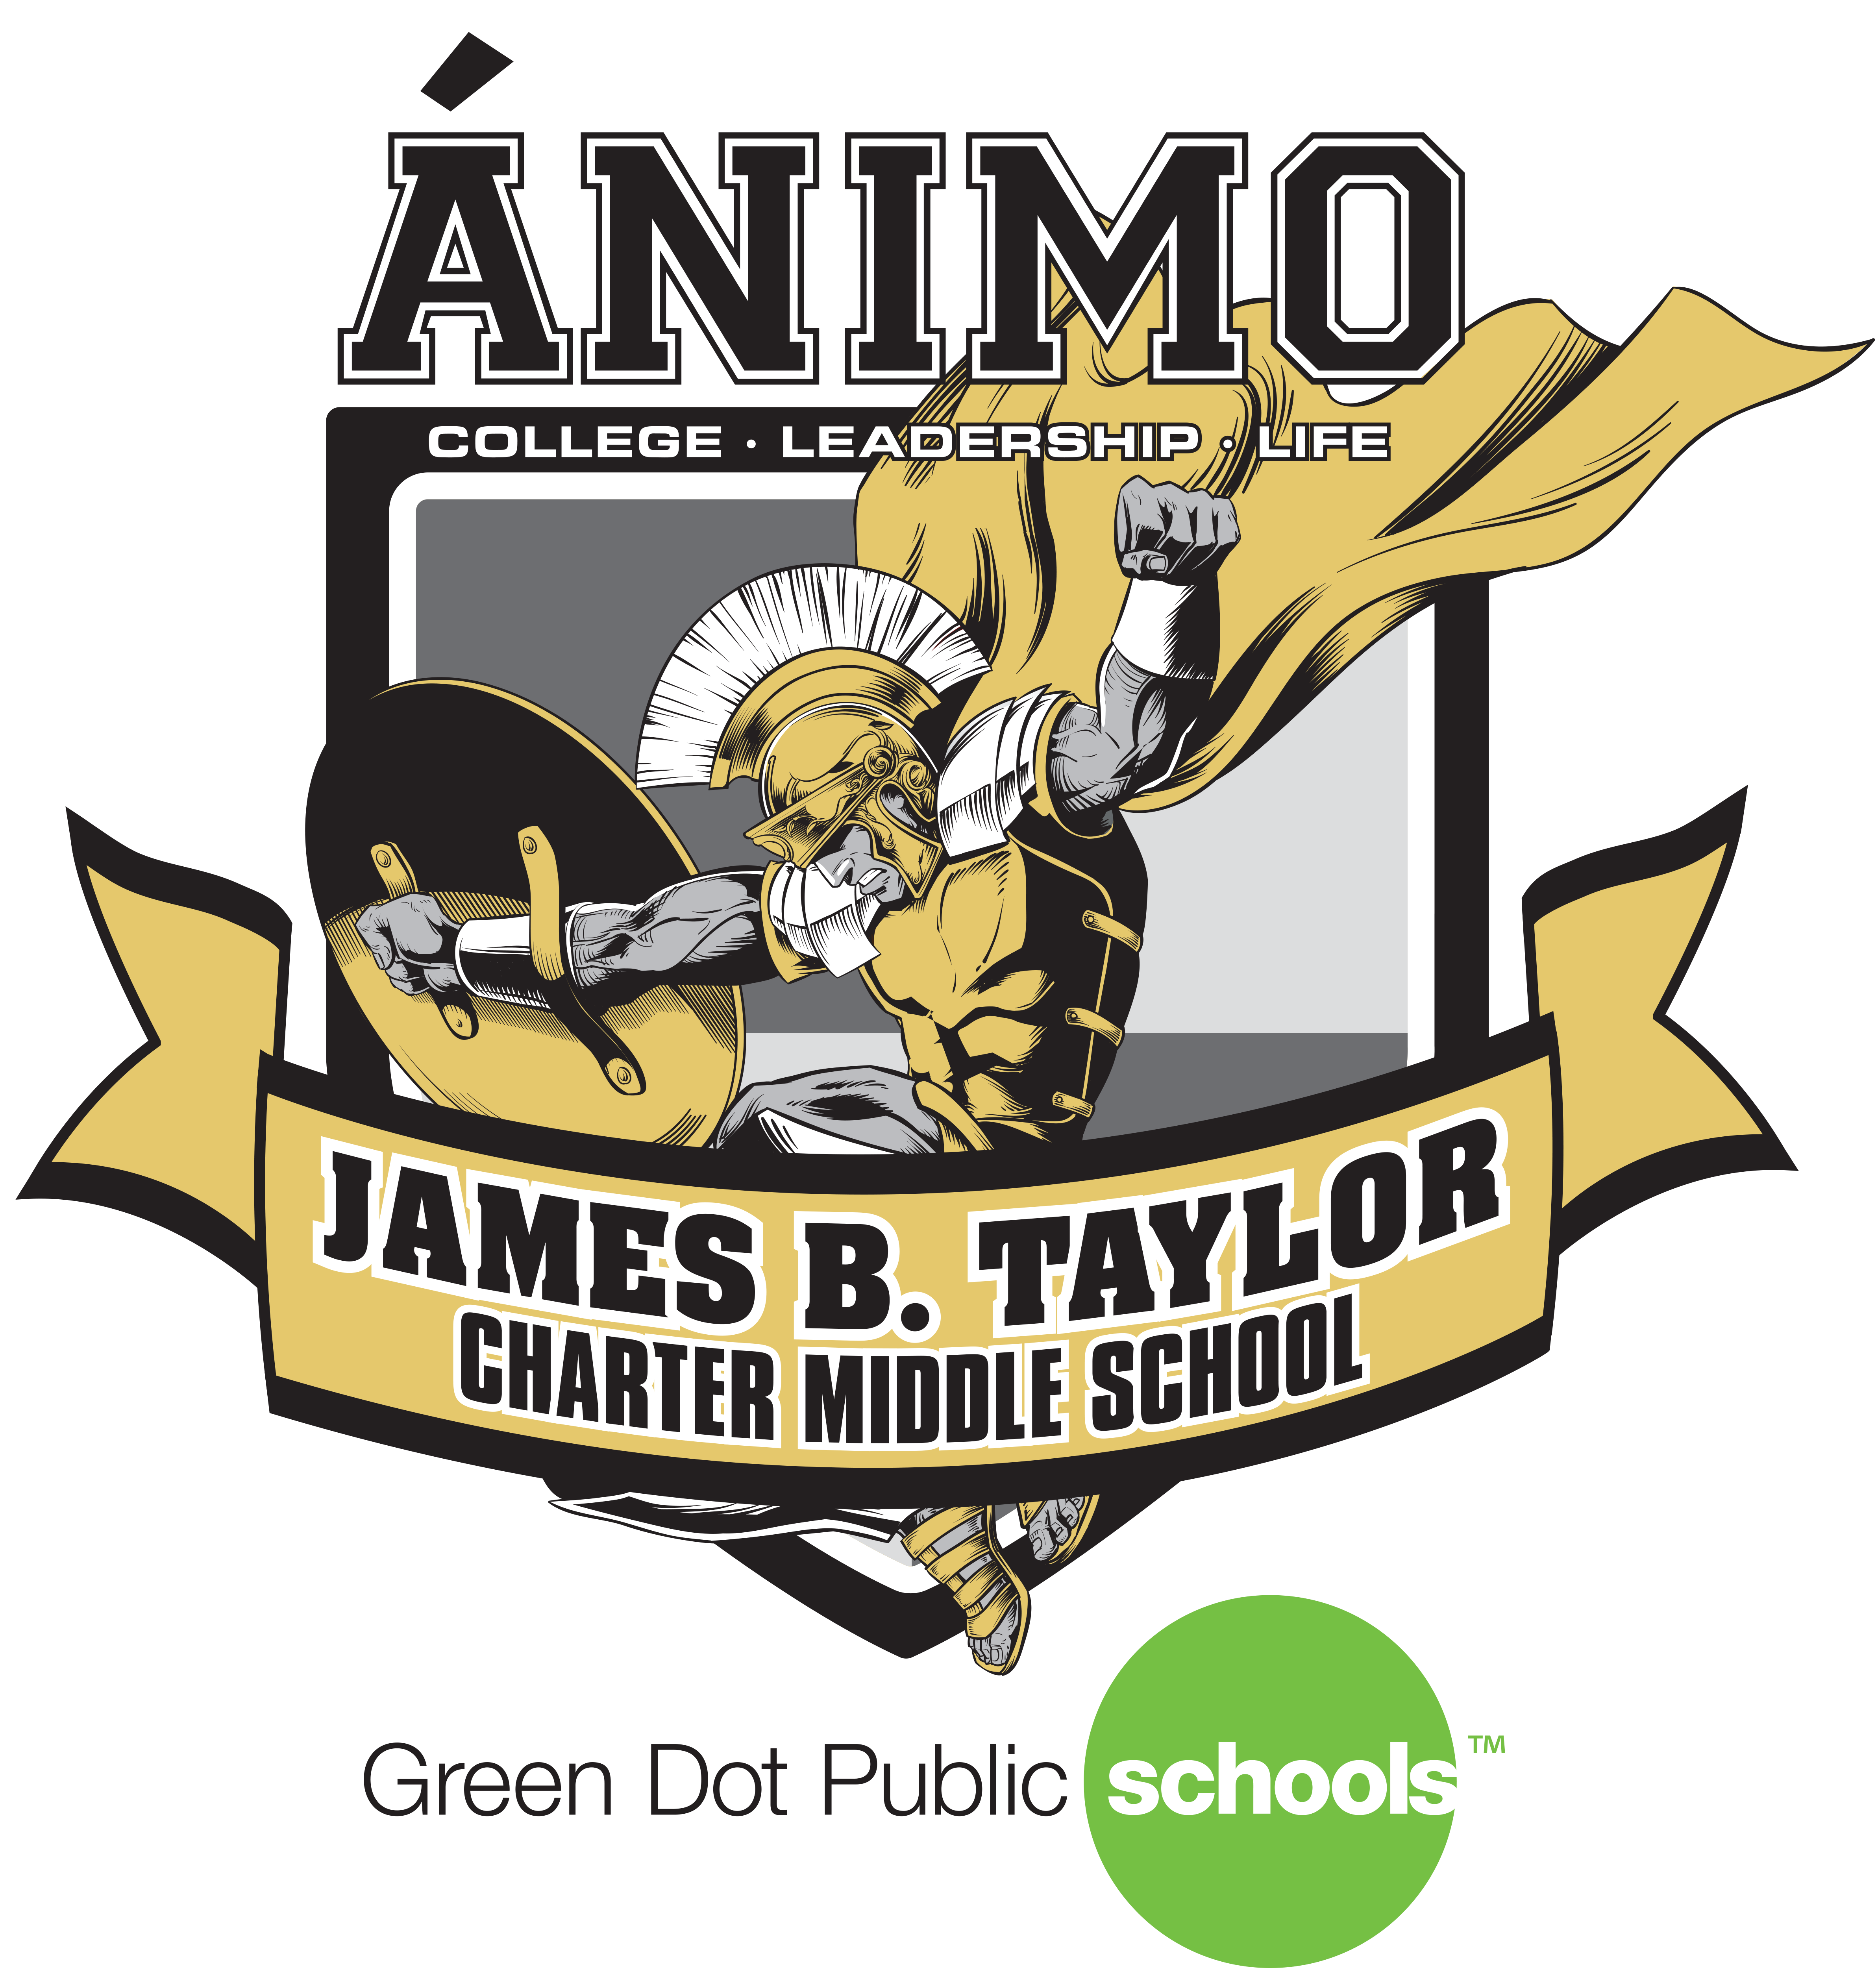 Enroll nimo james b. Curriculum clipart charter schools